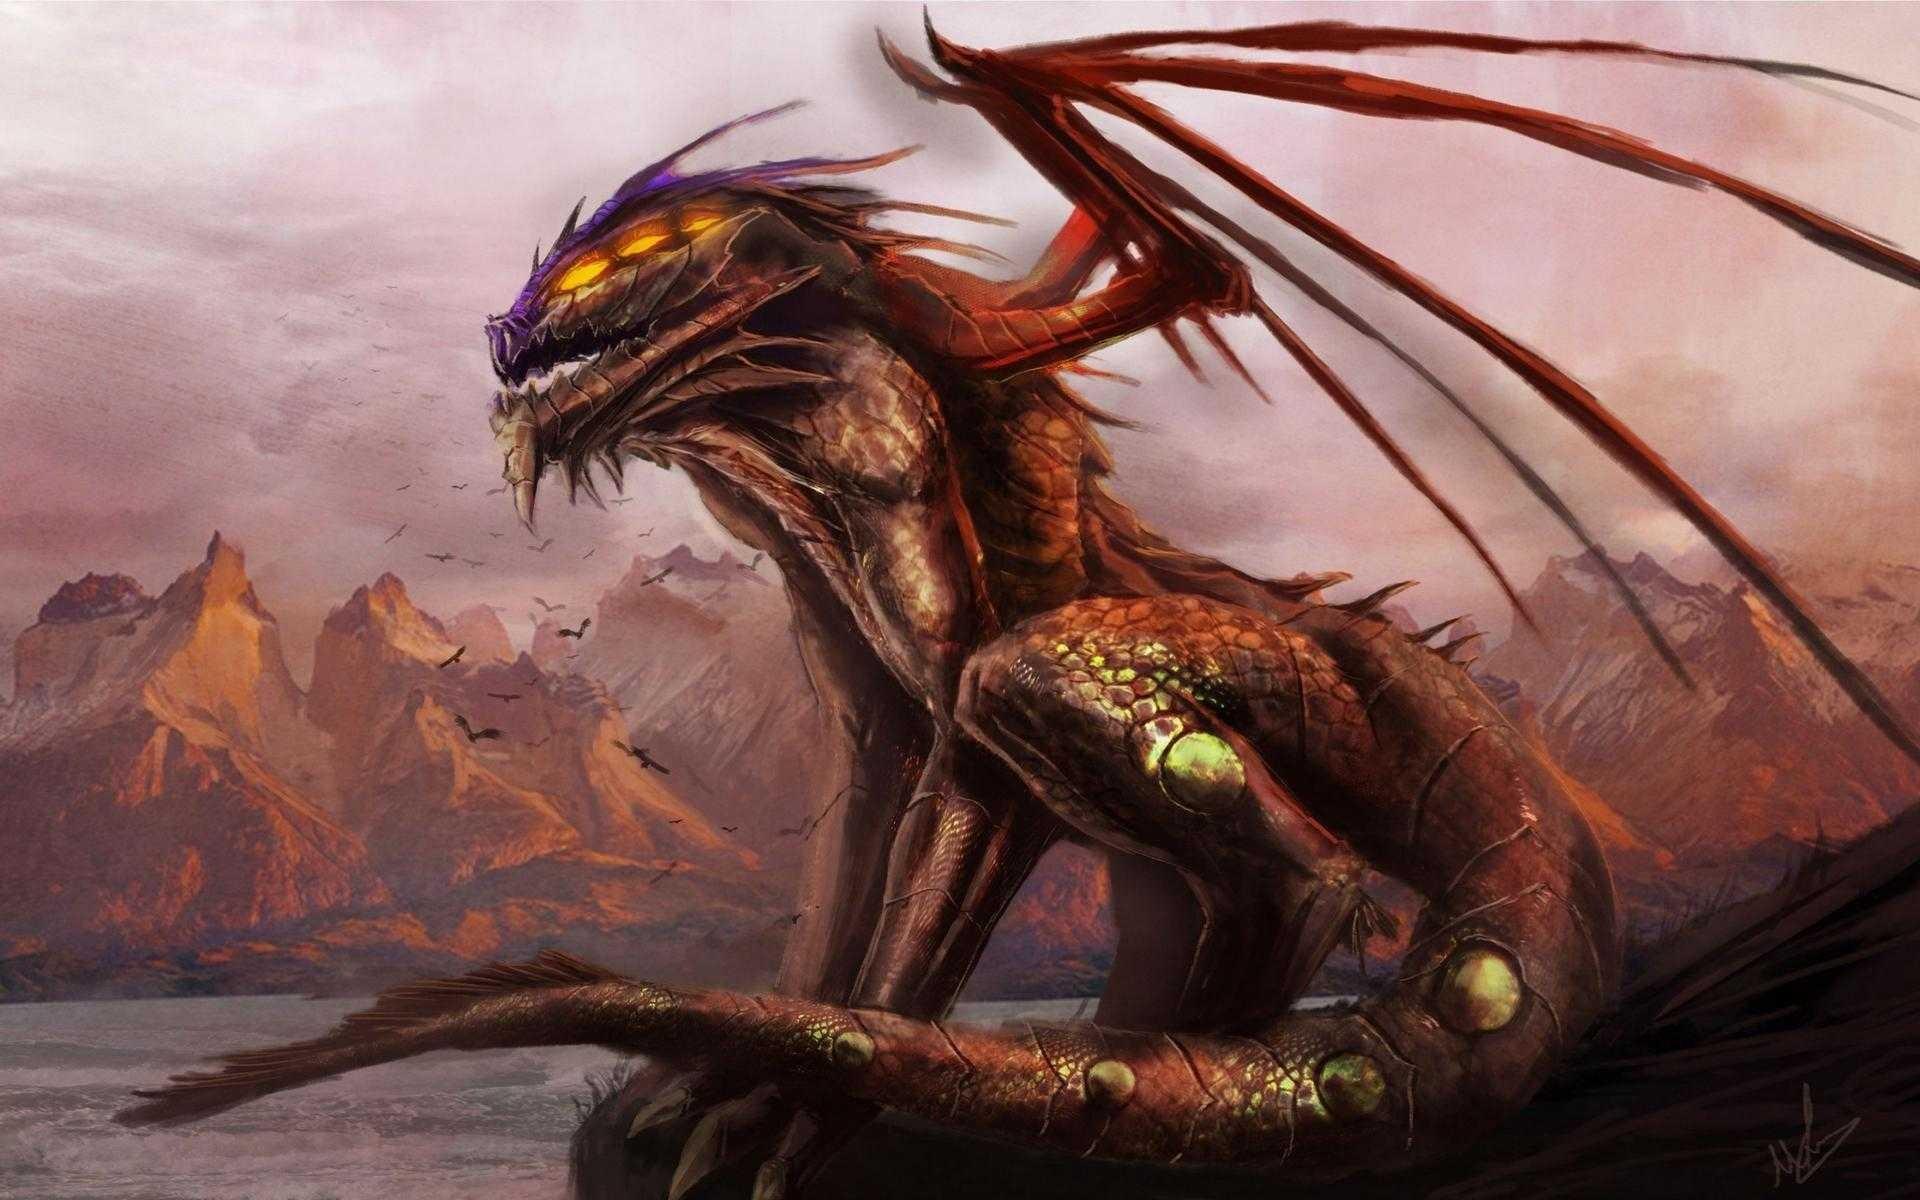 General 1920x1200 fantasy art creature dragon artwork